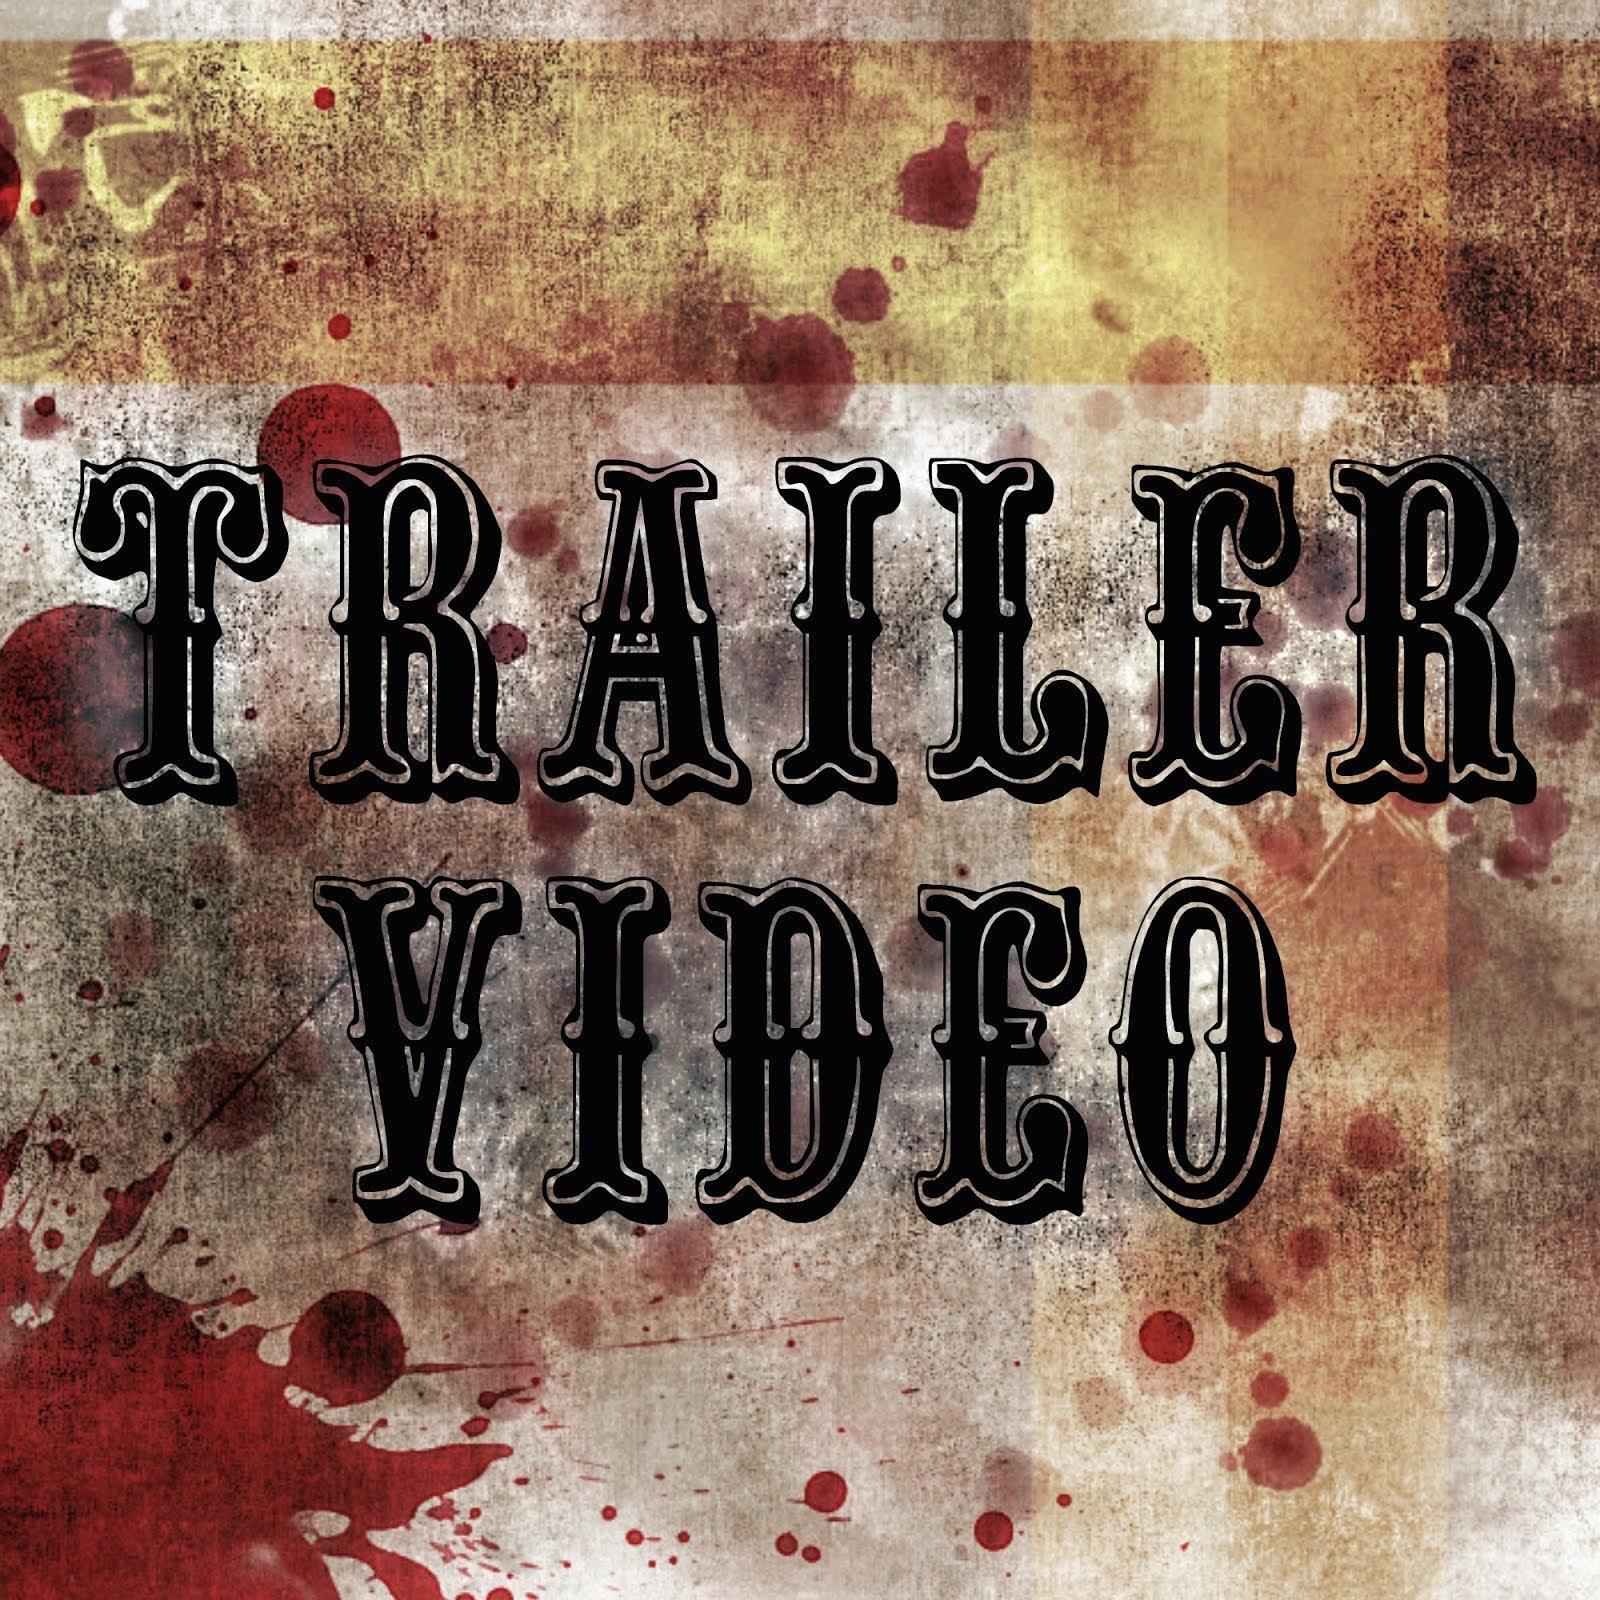 Trailer ↓